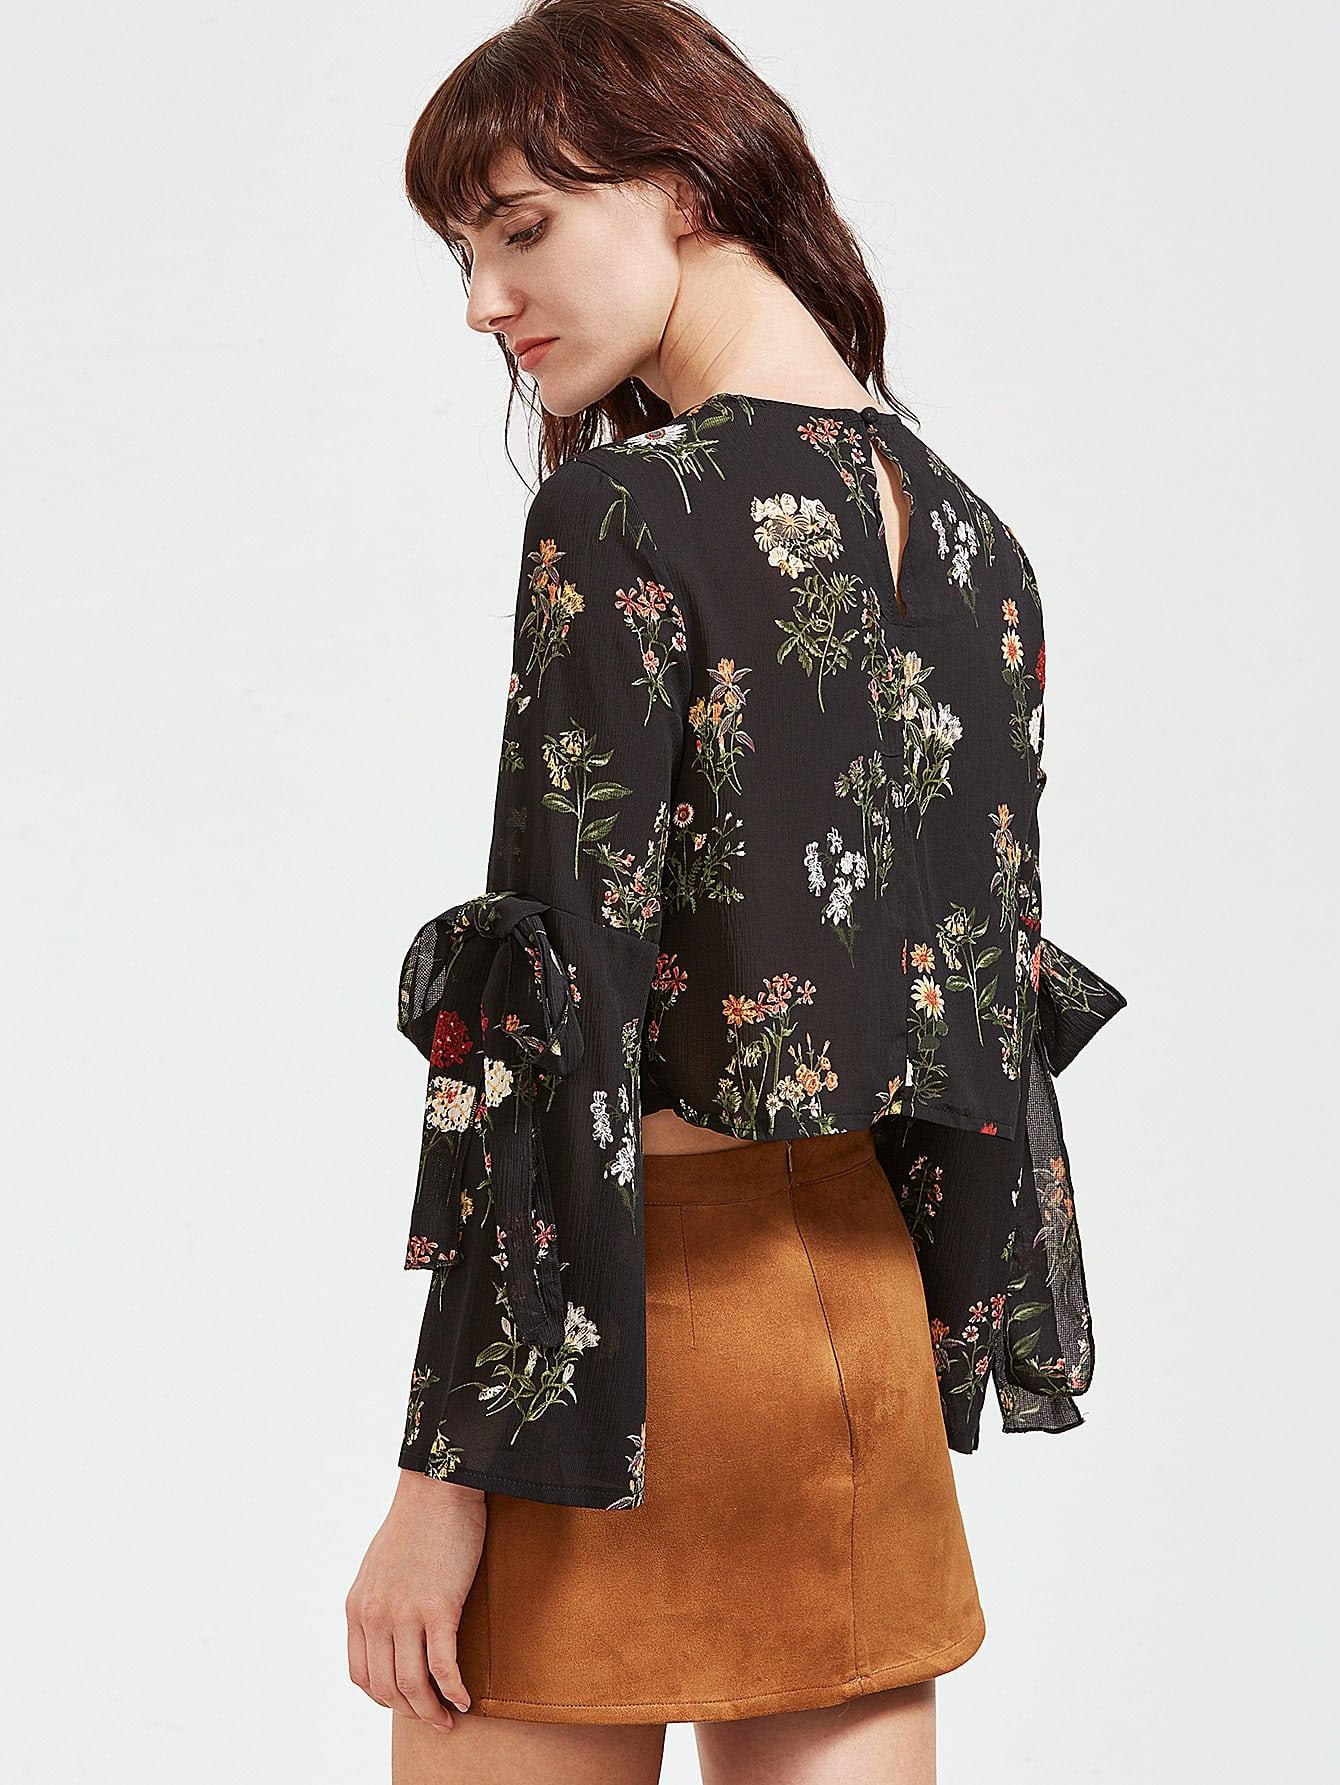 blouse170120440_2